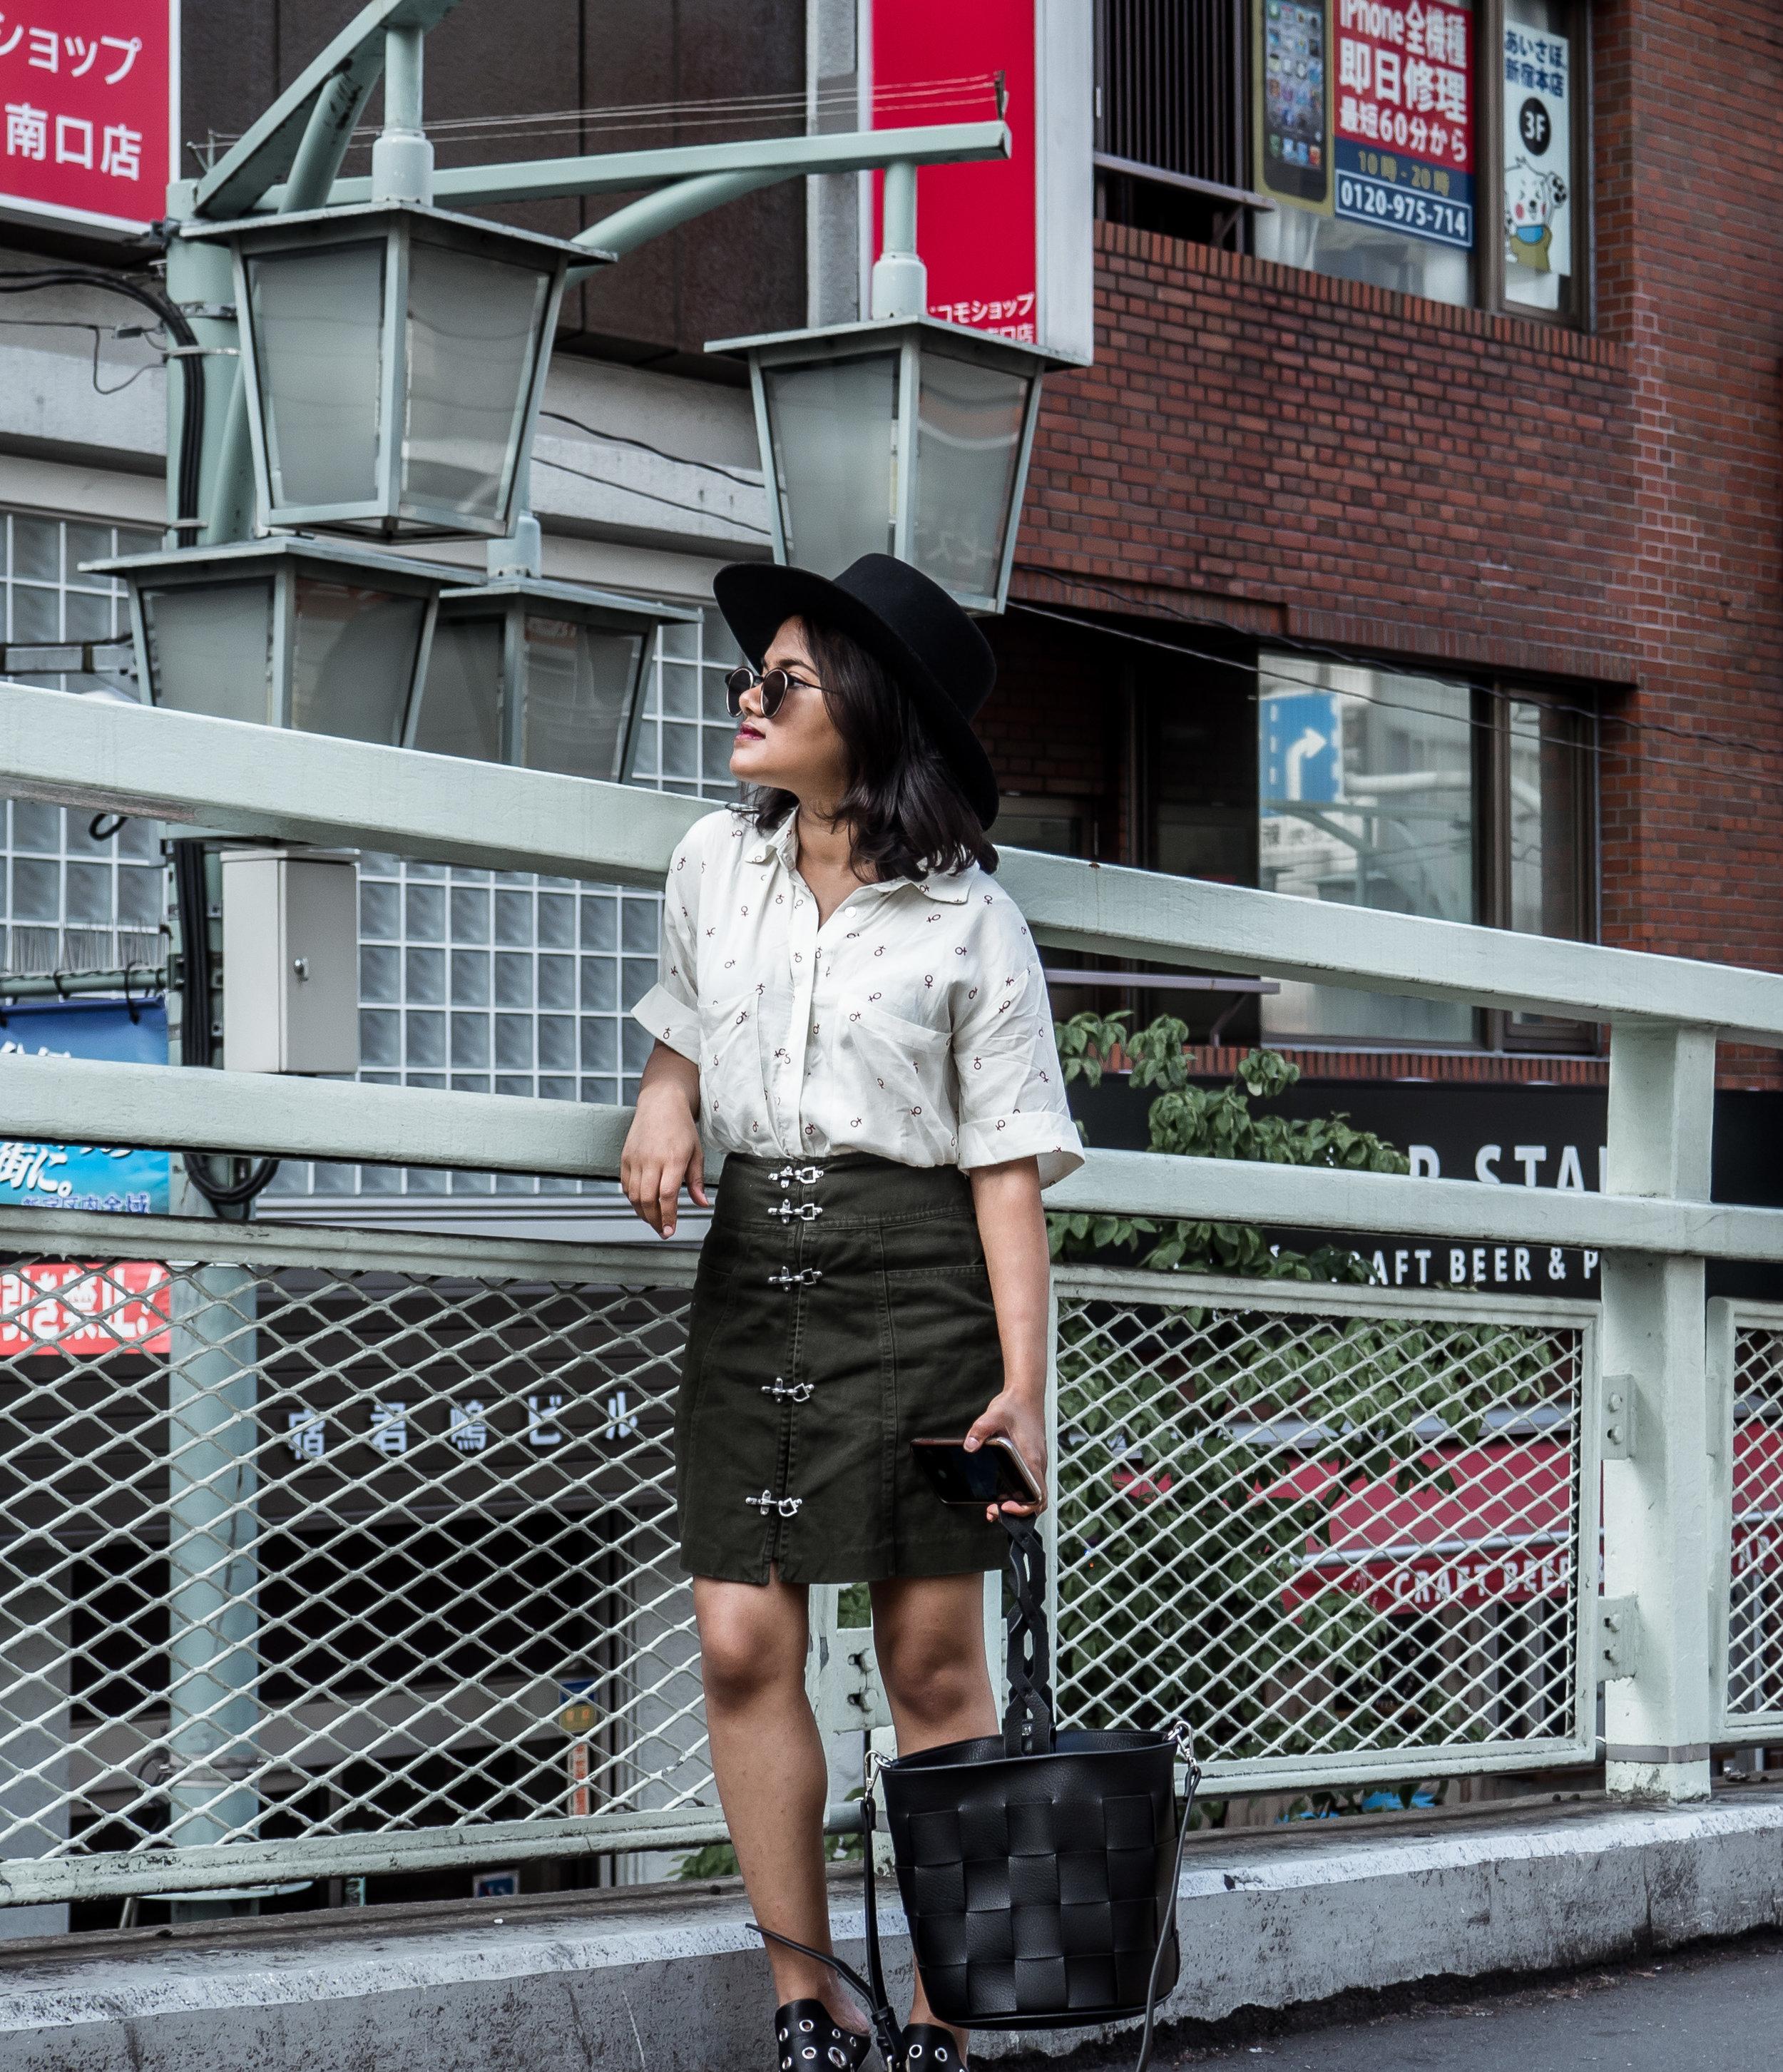 Knot Sister Future is Female Shirt in Shinjuku